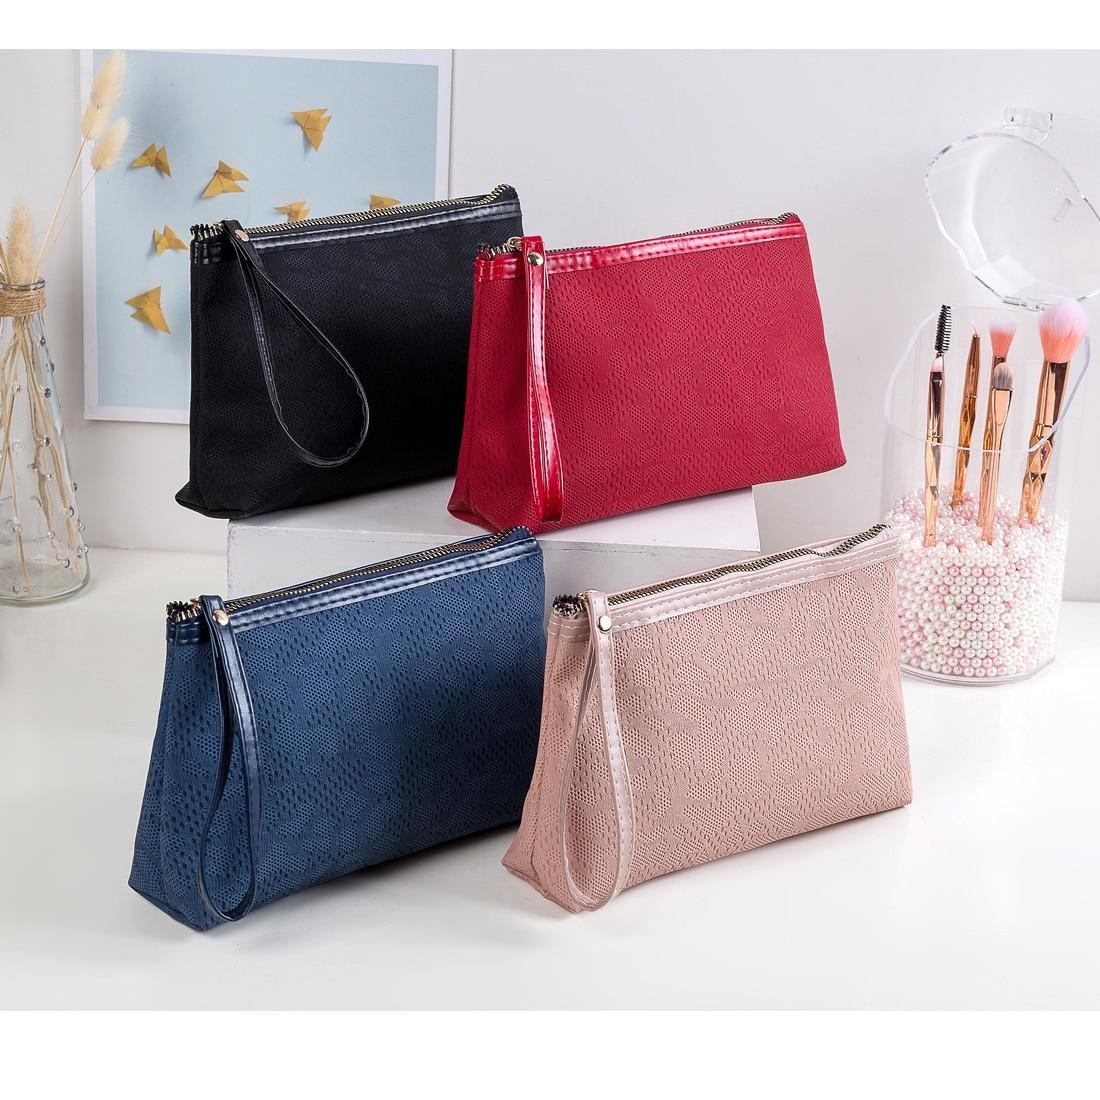 Portable  Cosmetic Bag Women Pouch Fashion Lady Makeup 2020 New Travel Organizer Bag Travel Makeup  PU Leather Makeup Bag